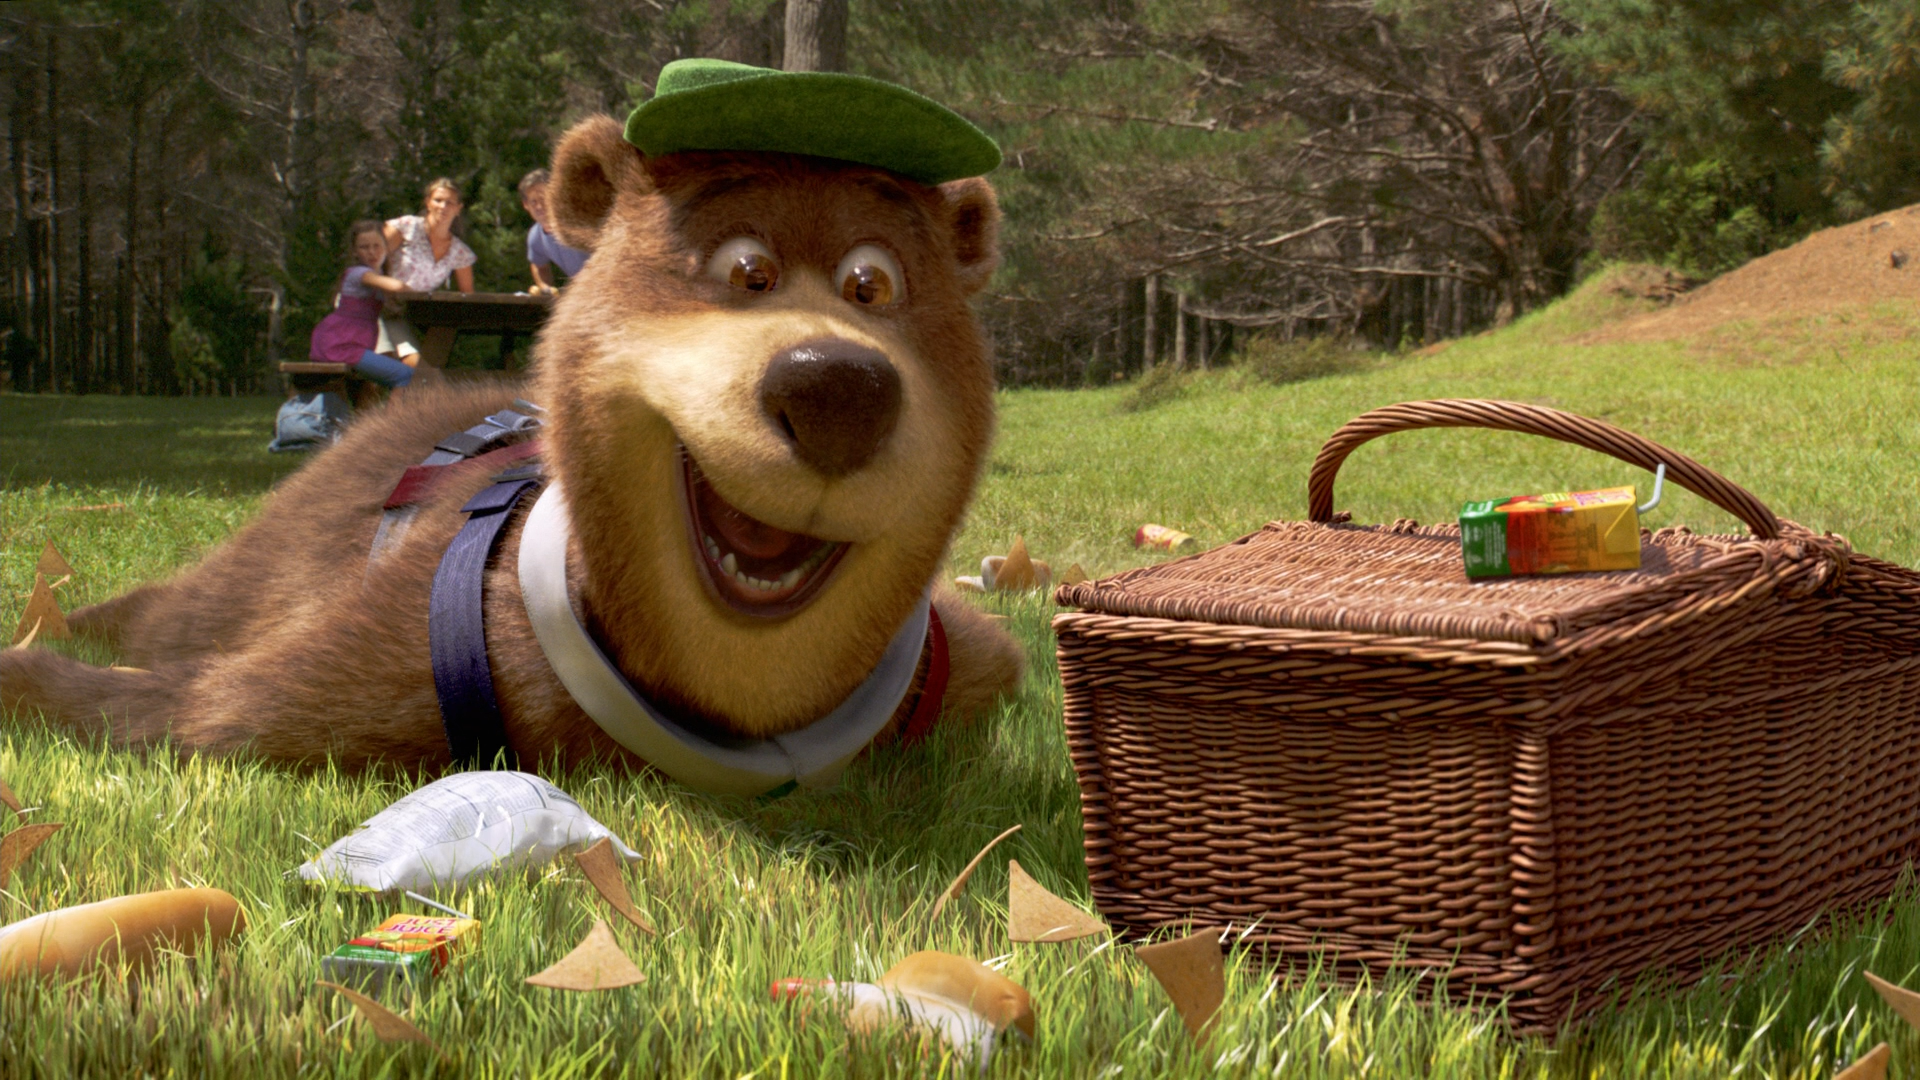 Yogi Bear Quotes Picnic Basket: Yogi Bear With Picnic Basket